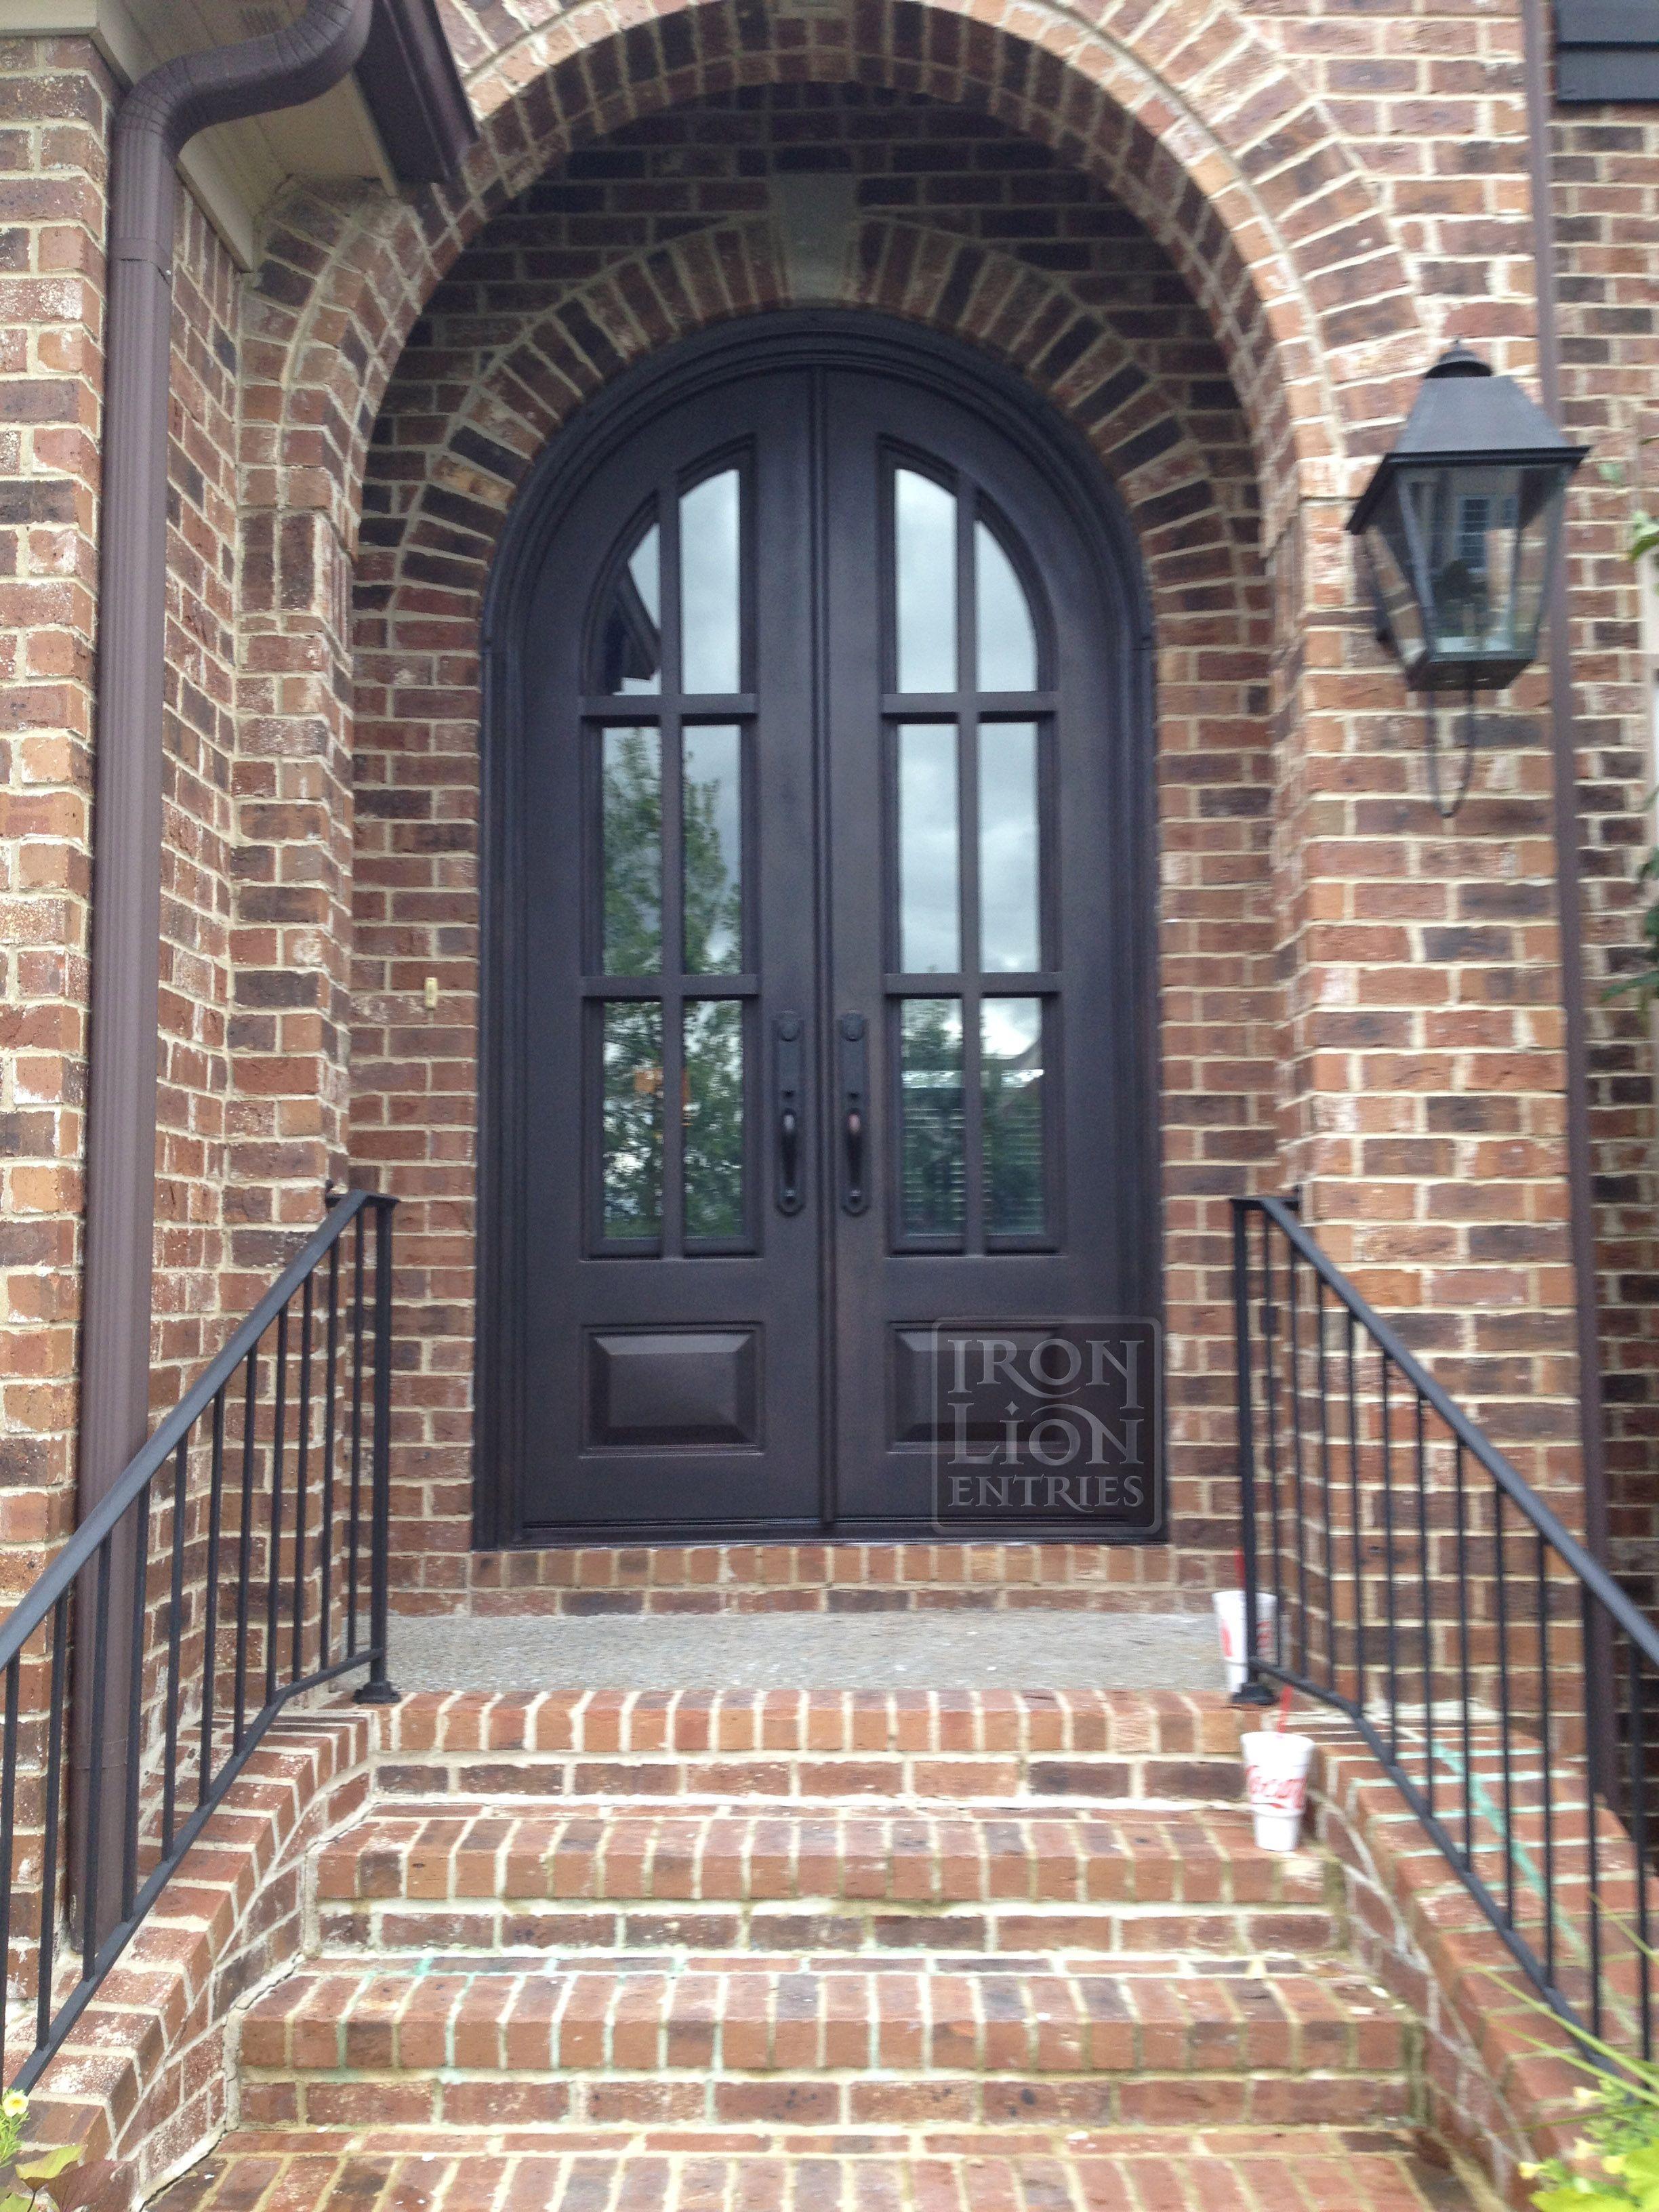 Wrought Iron Entry Door Ironentrydoor Iron Door Iron Lion Entries 10ft Custom Iron Entry Door Iron Doors Iron Front Door Iron Entry Doors